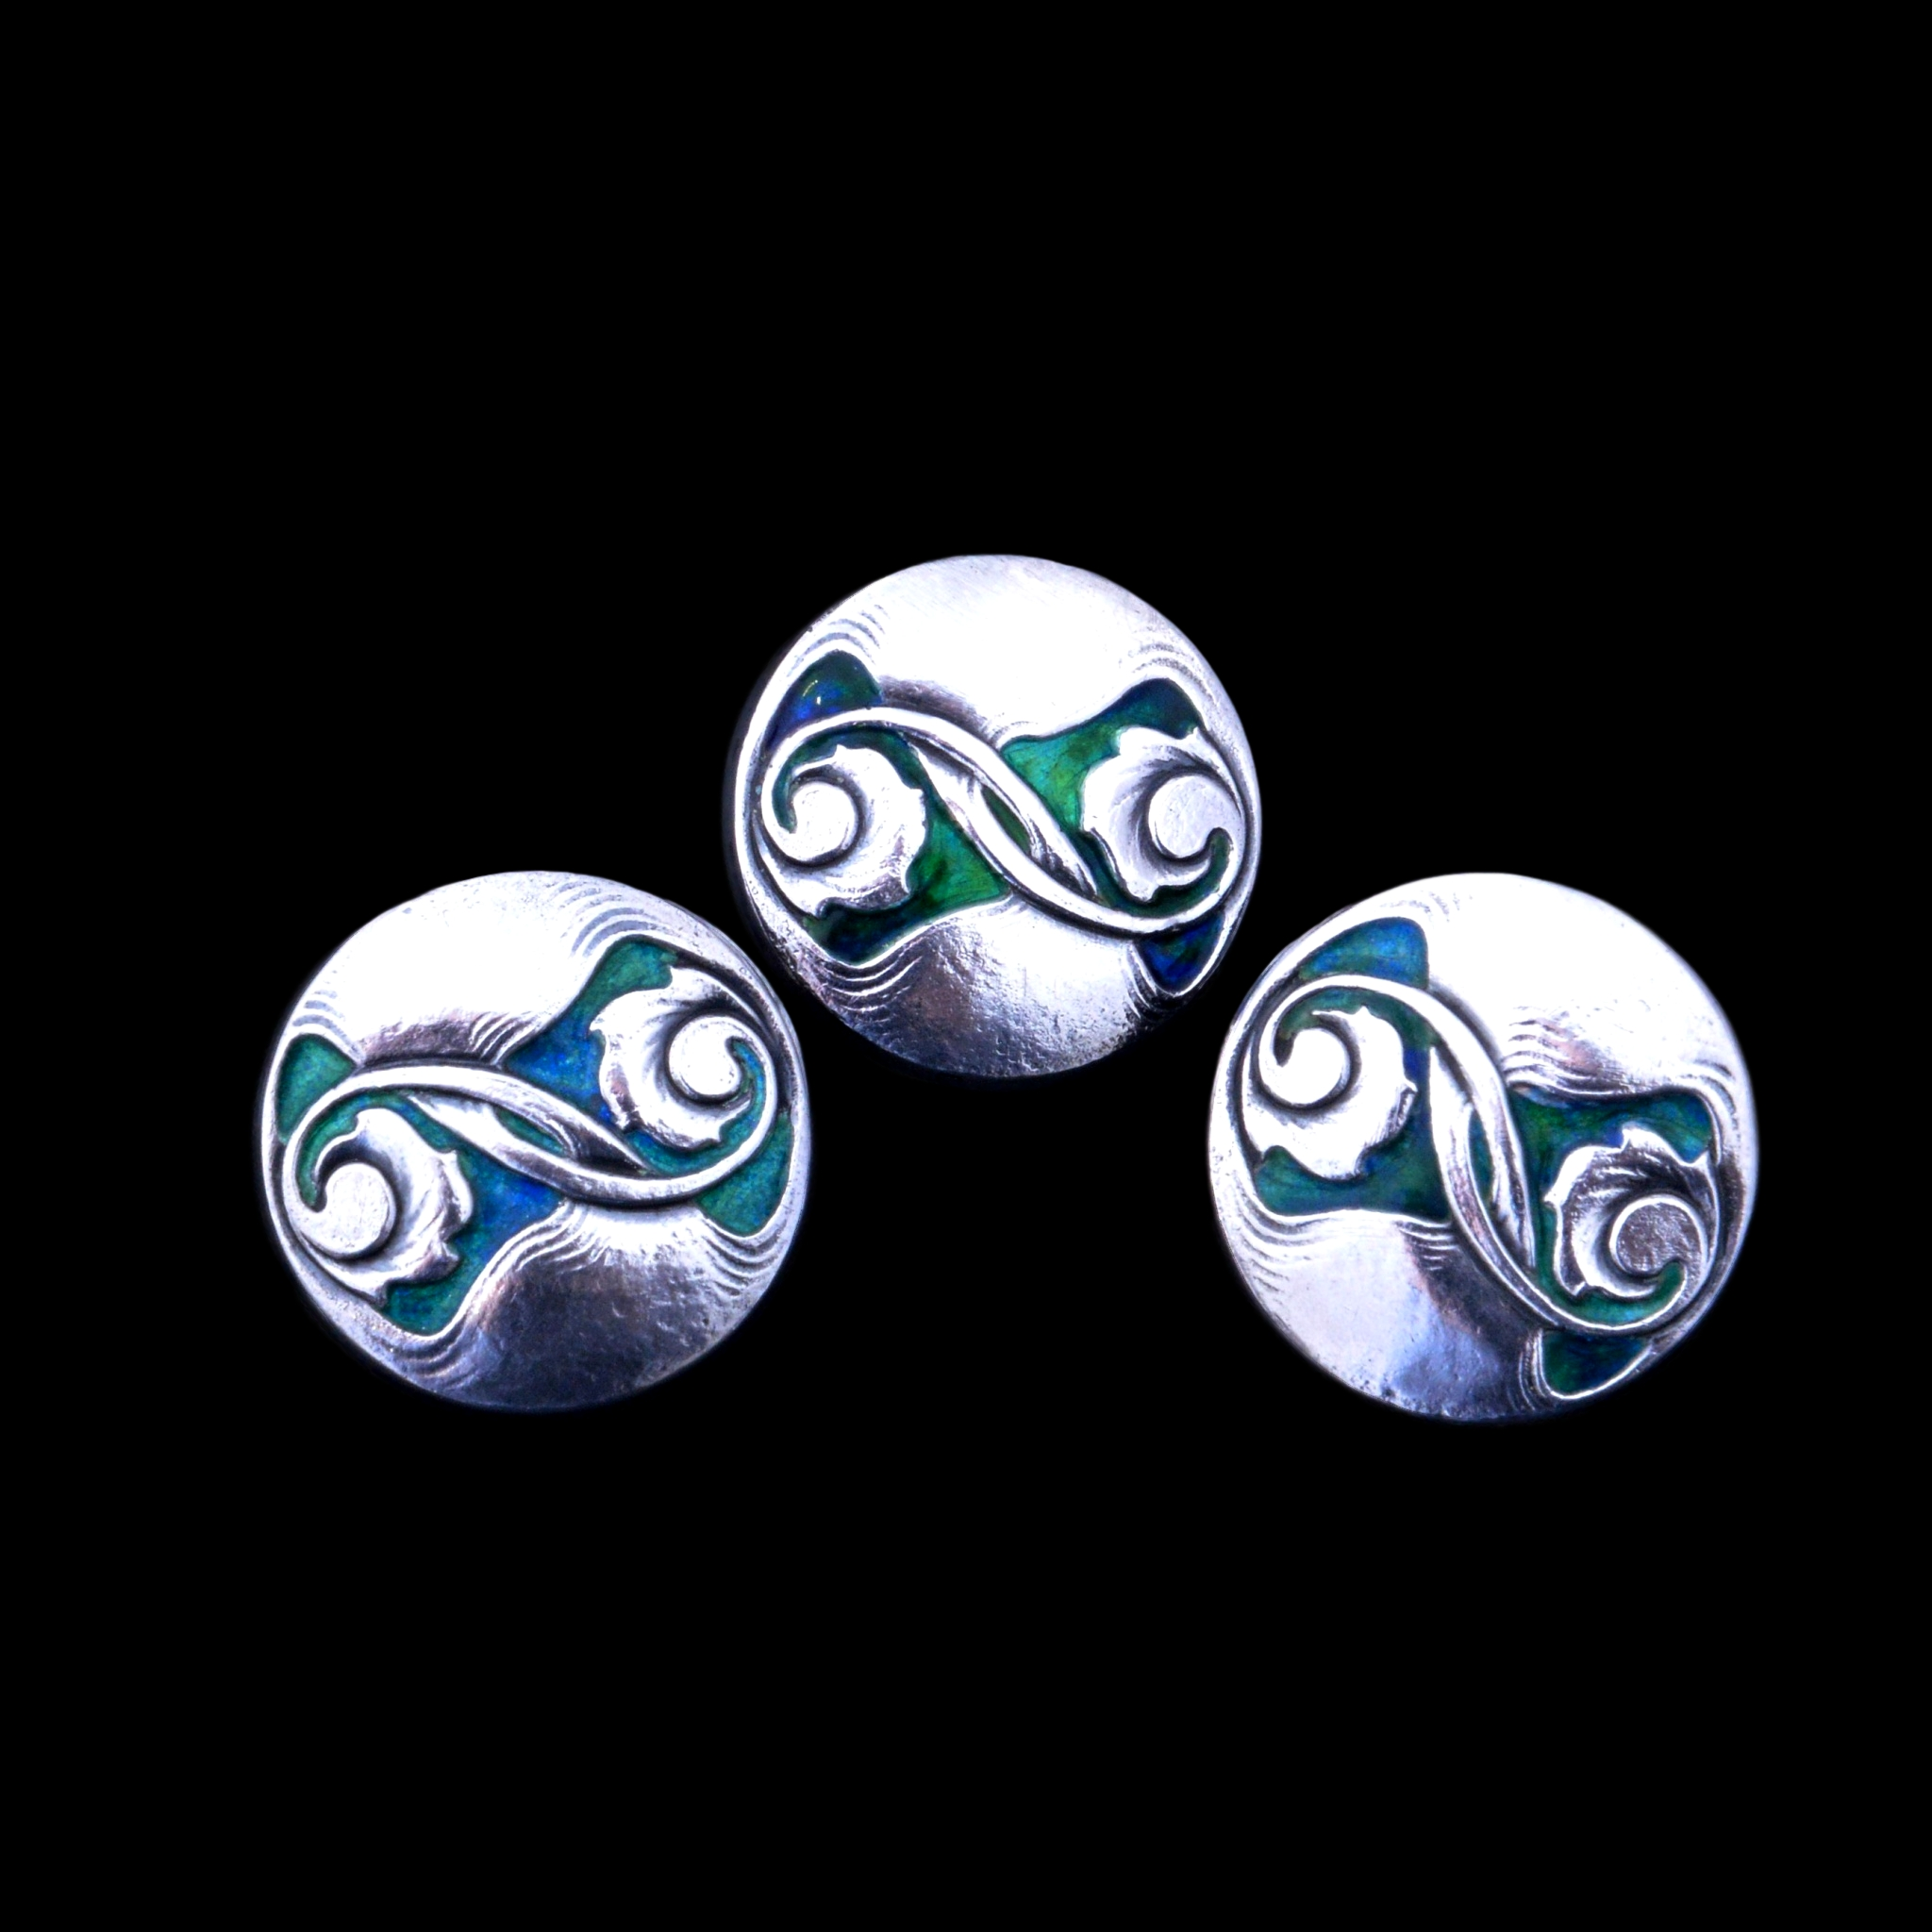 Liberty cymric buttons, Archibald Knox buttons